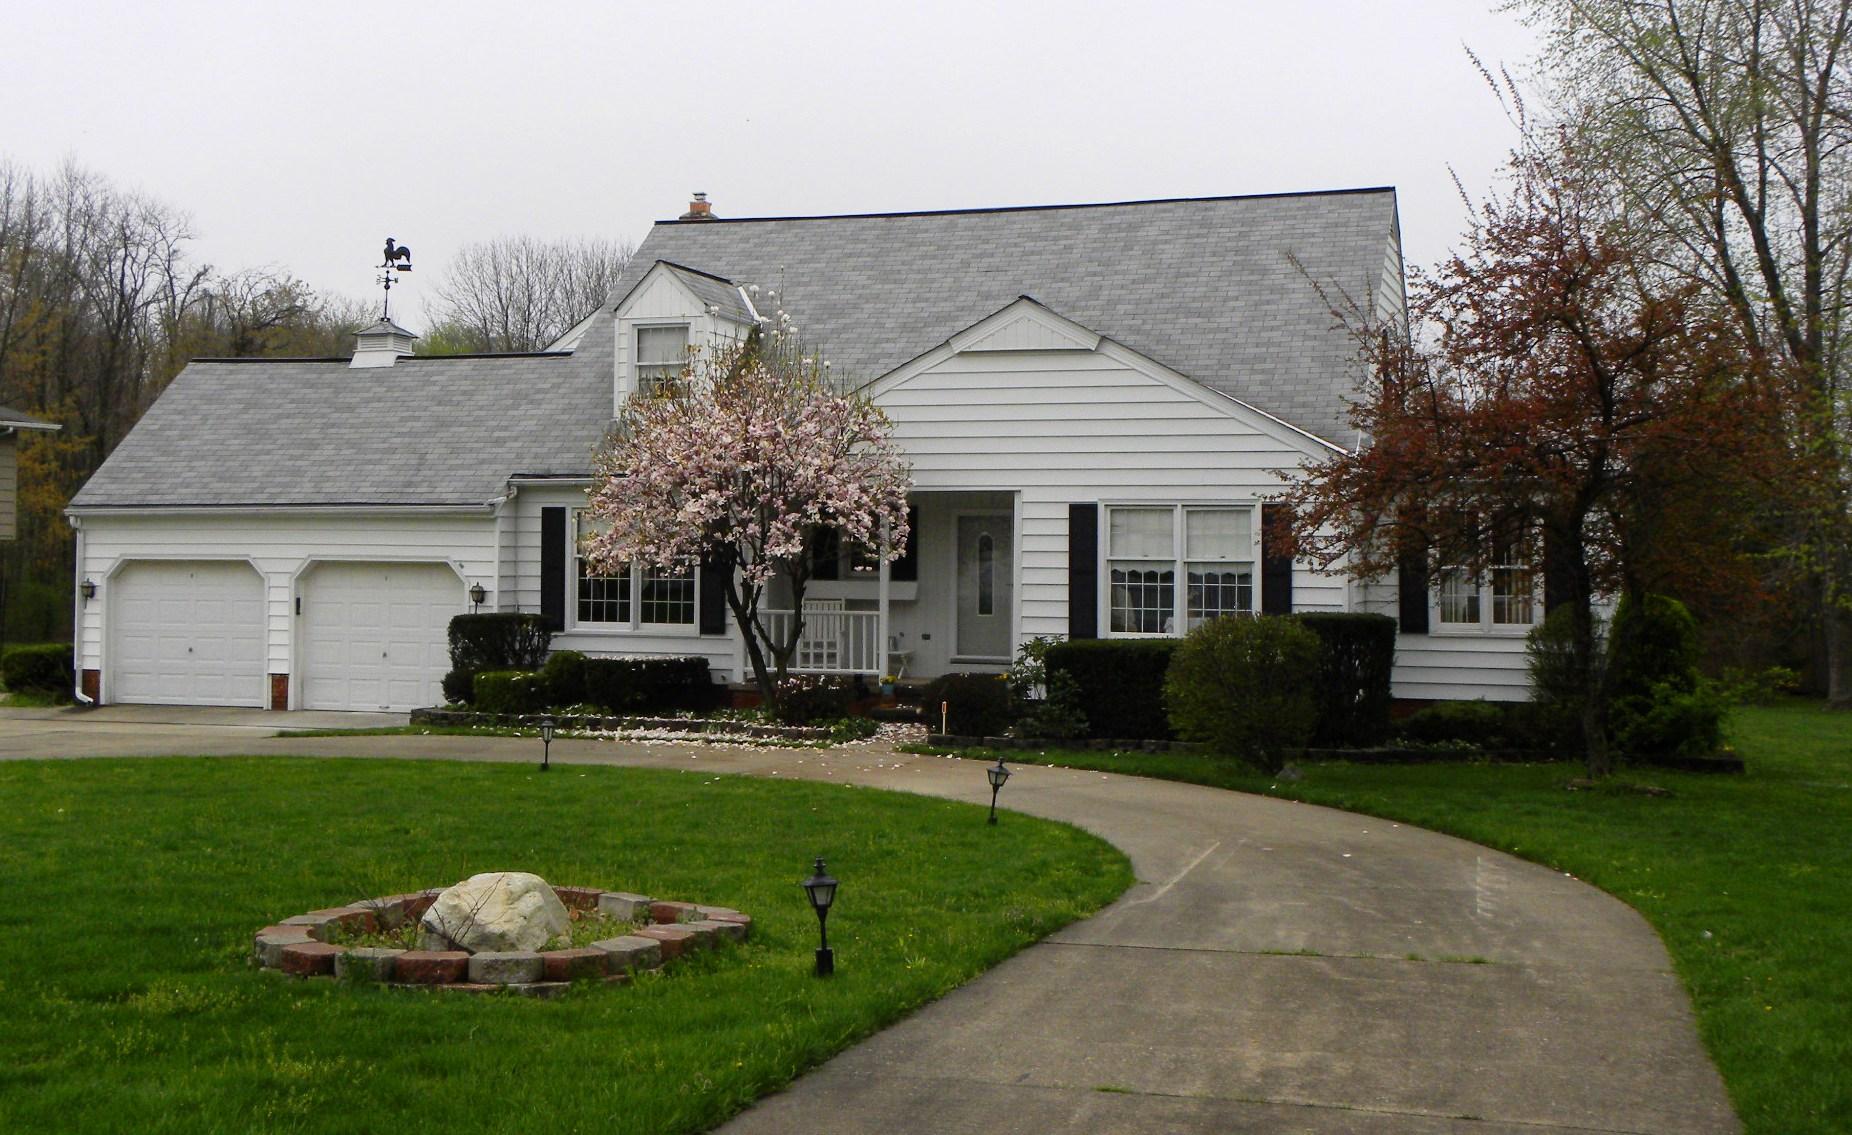 10600 Hickory Hill, Kirtland, OH 44094